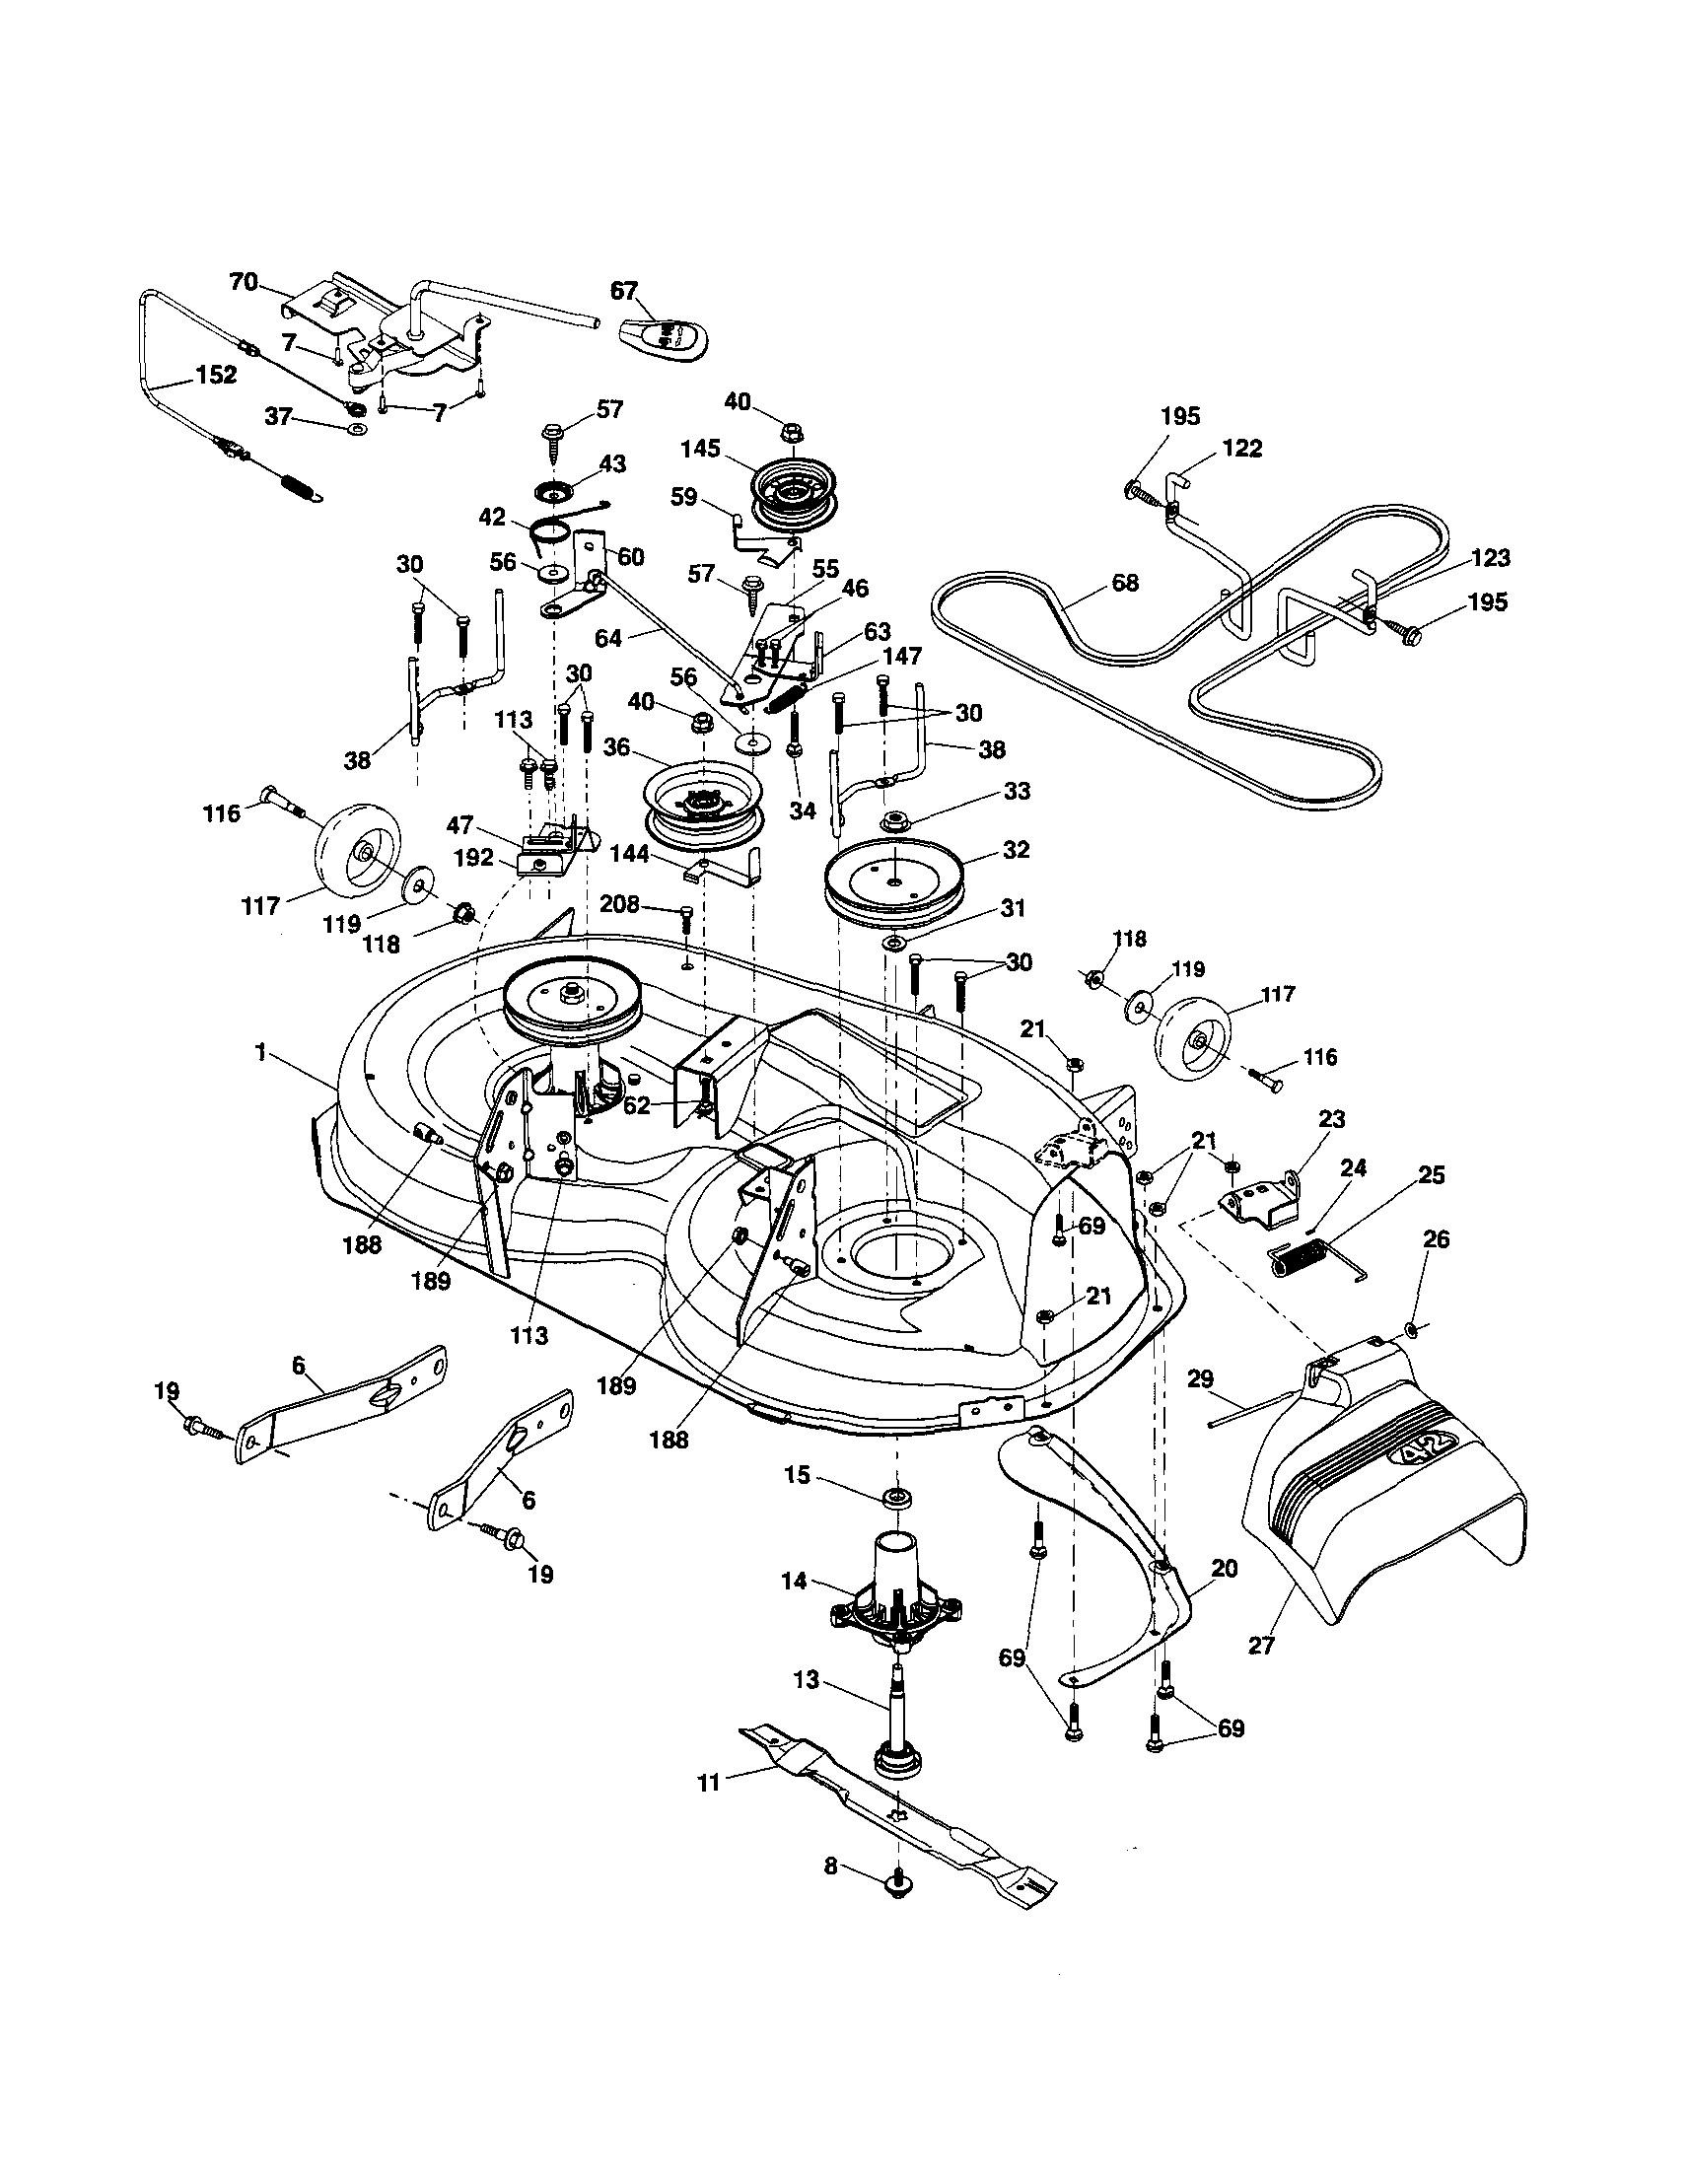 Ariens lawn mower parts diagram my wiring diagram small tractor engine diagram ariens lawn mower parts